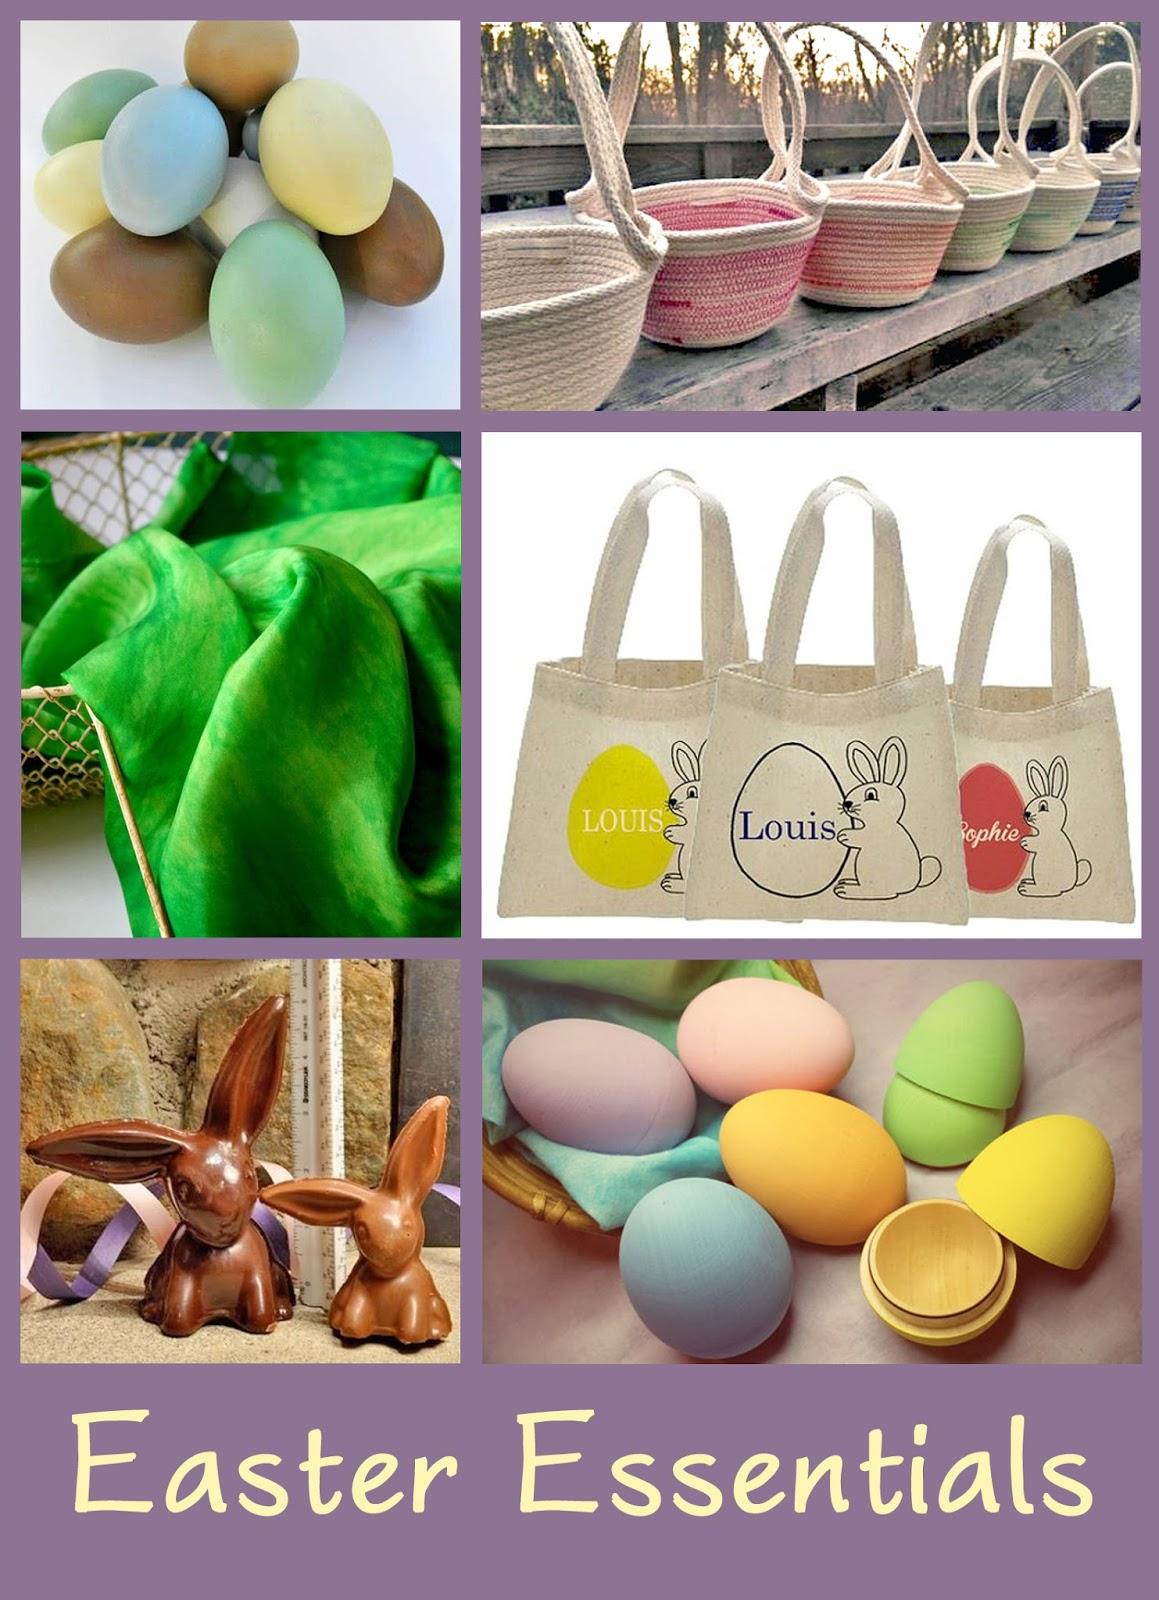 Handmade Easter Baskets Ideas : The mindful home handmade easter basket gift ideas